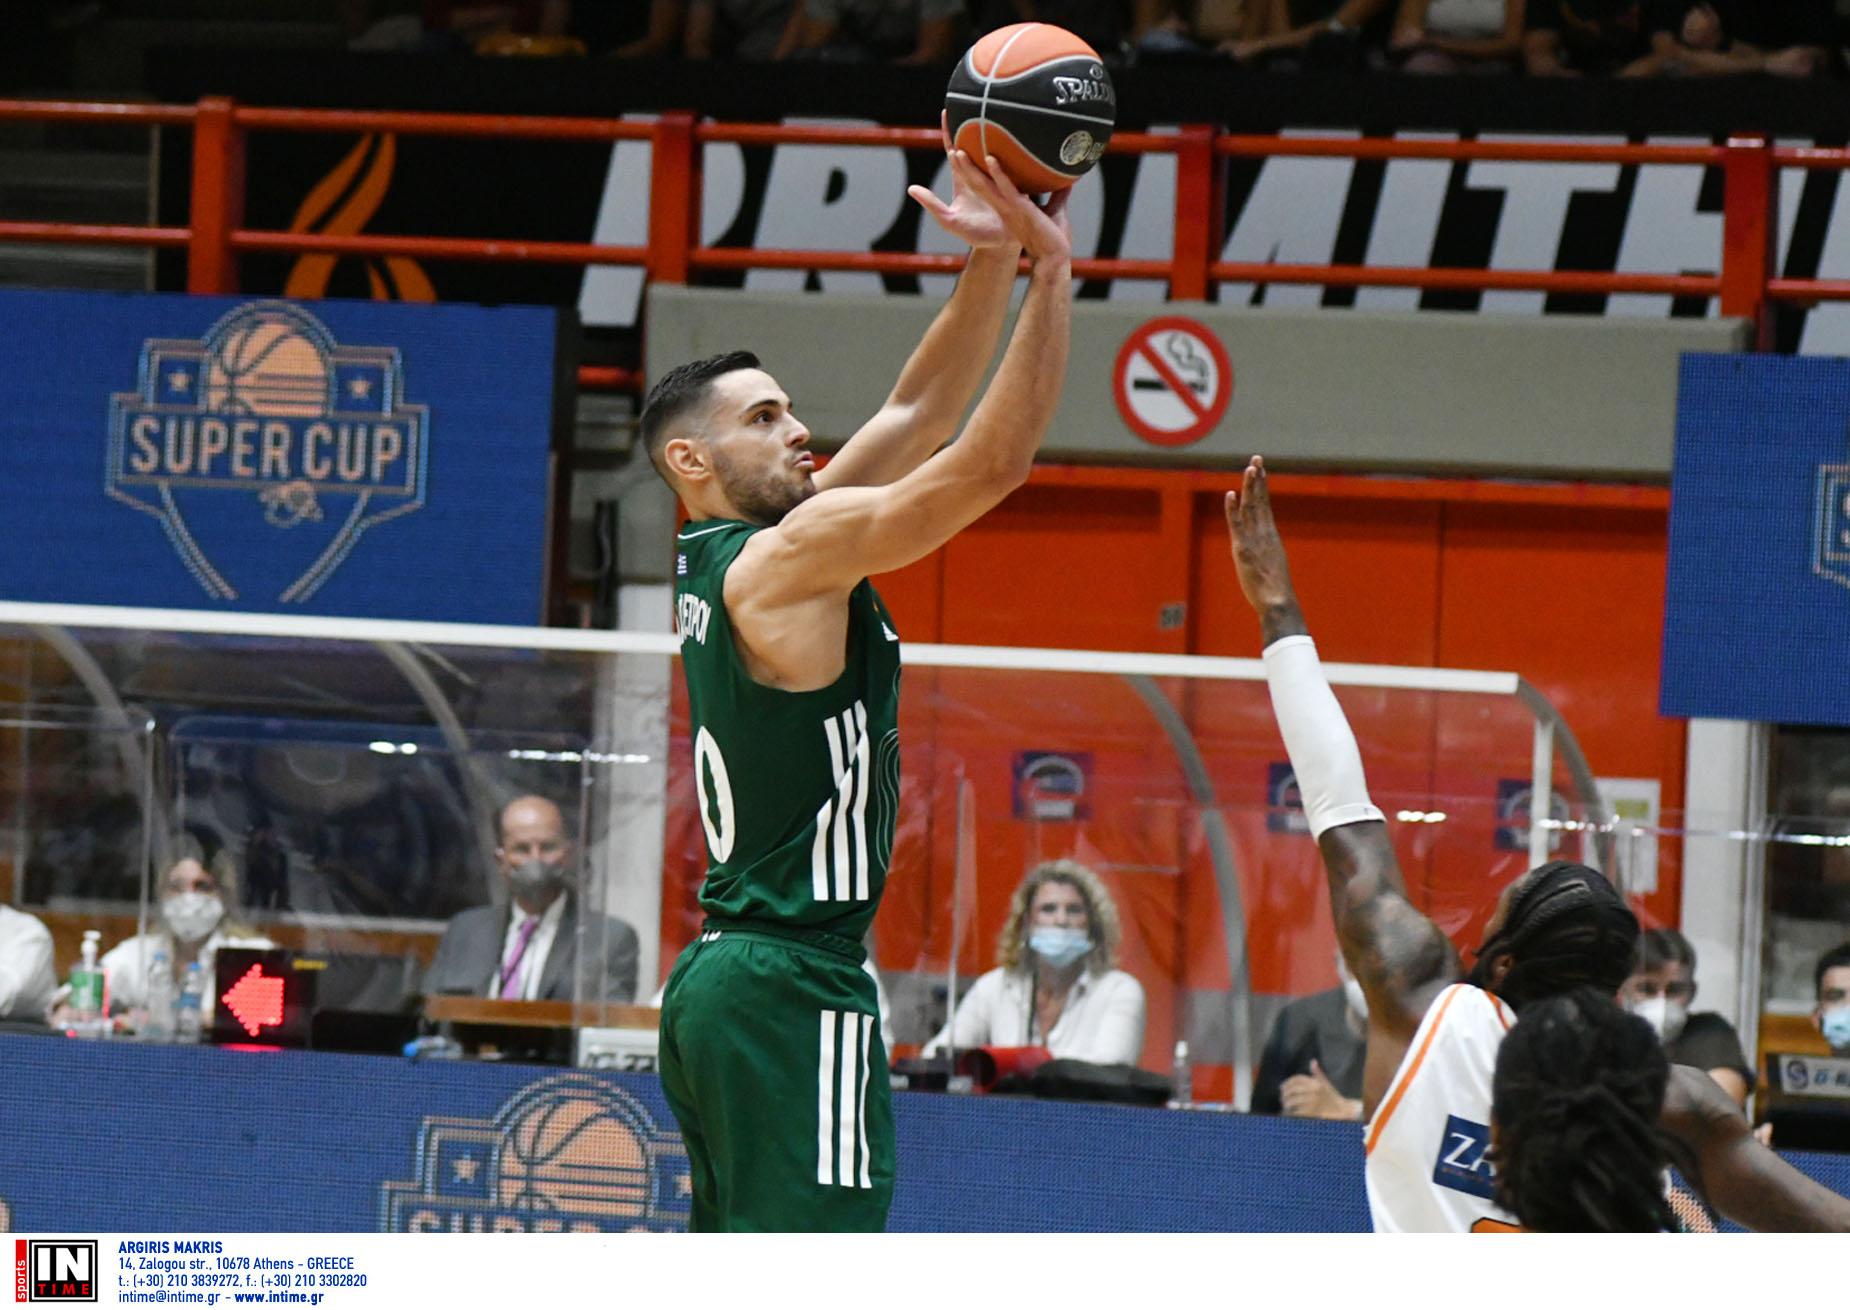 Super Cup, Παναθηναϊκός – Προμηθέας 92-83: Πράσινος ο πρώτος τίτλος της σεζόν στο μπάσκετ